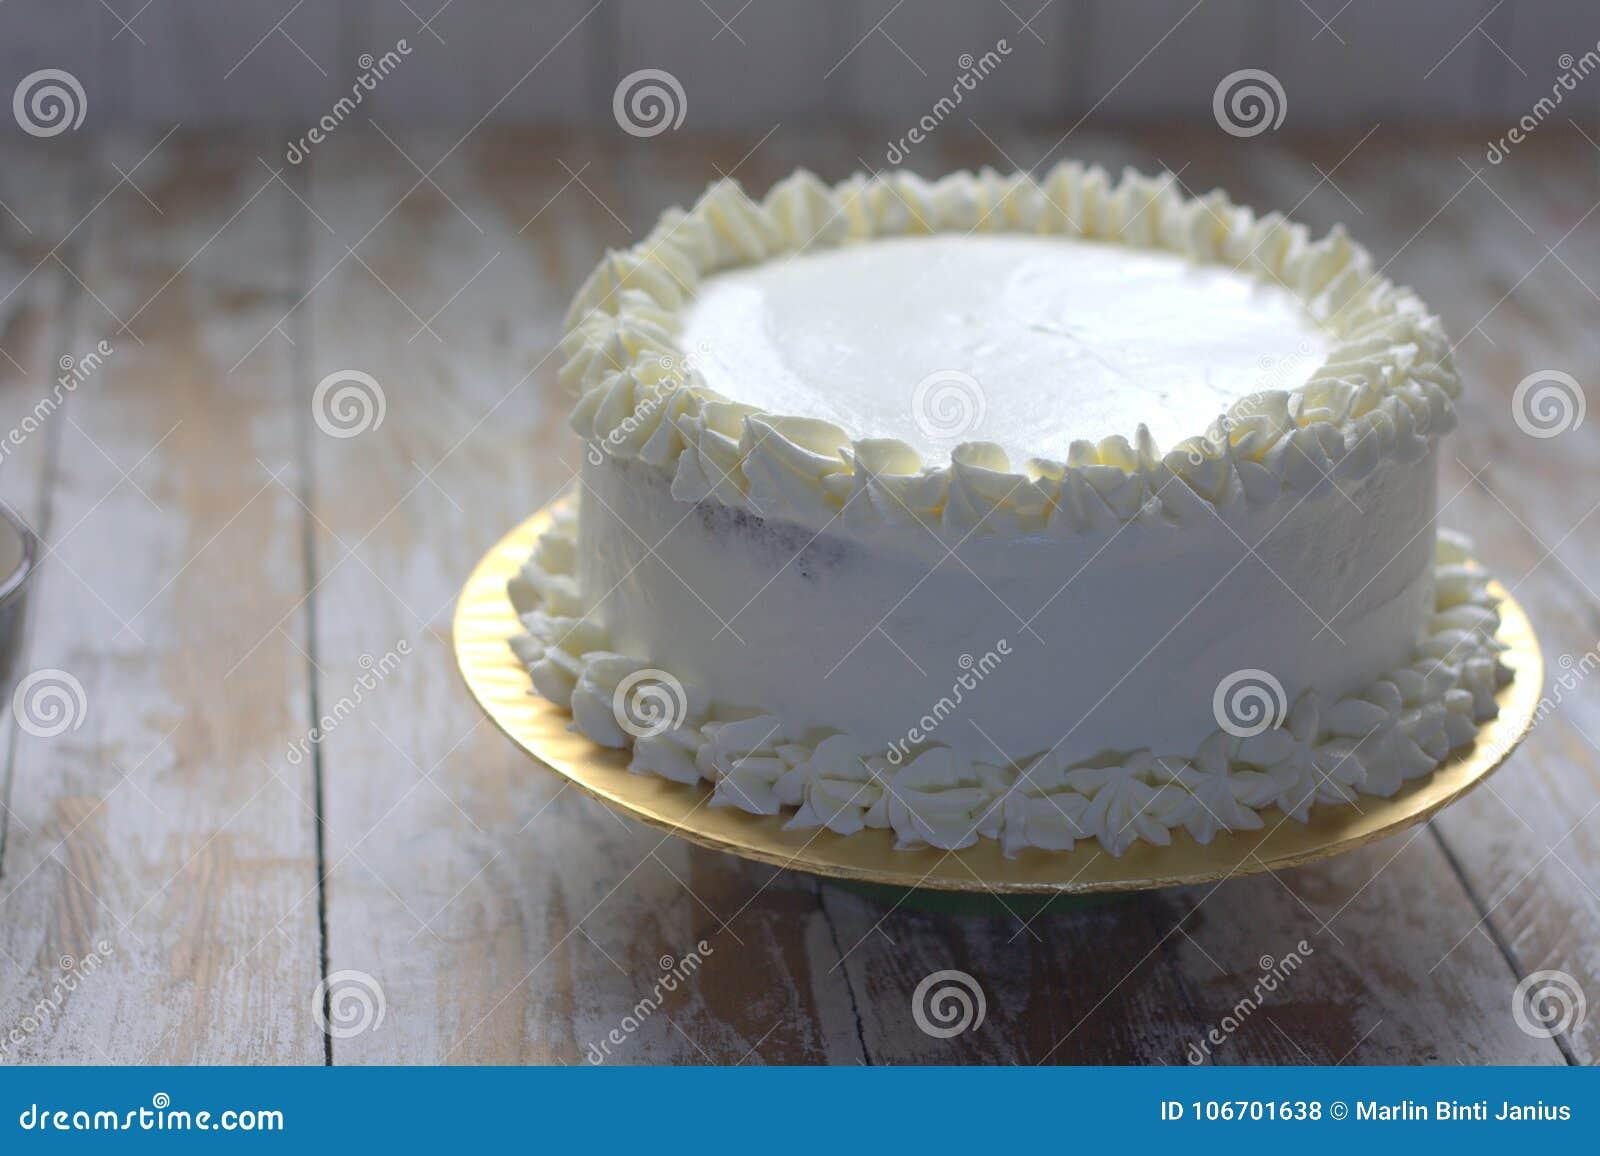 Terrific White Simple Elegant Cake Stock Photo Image Of Confection 106701638 Funny Birthday Cards Online Bapapcheapnameinfo